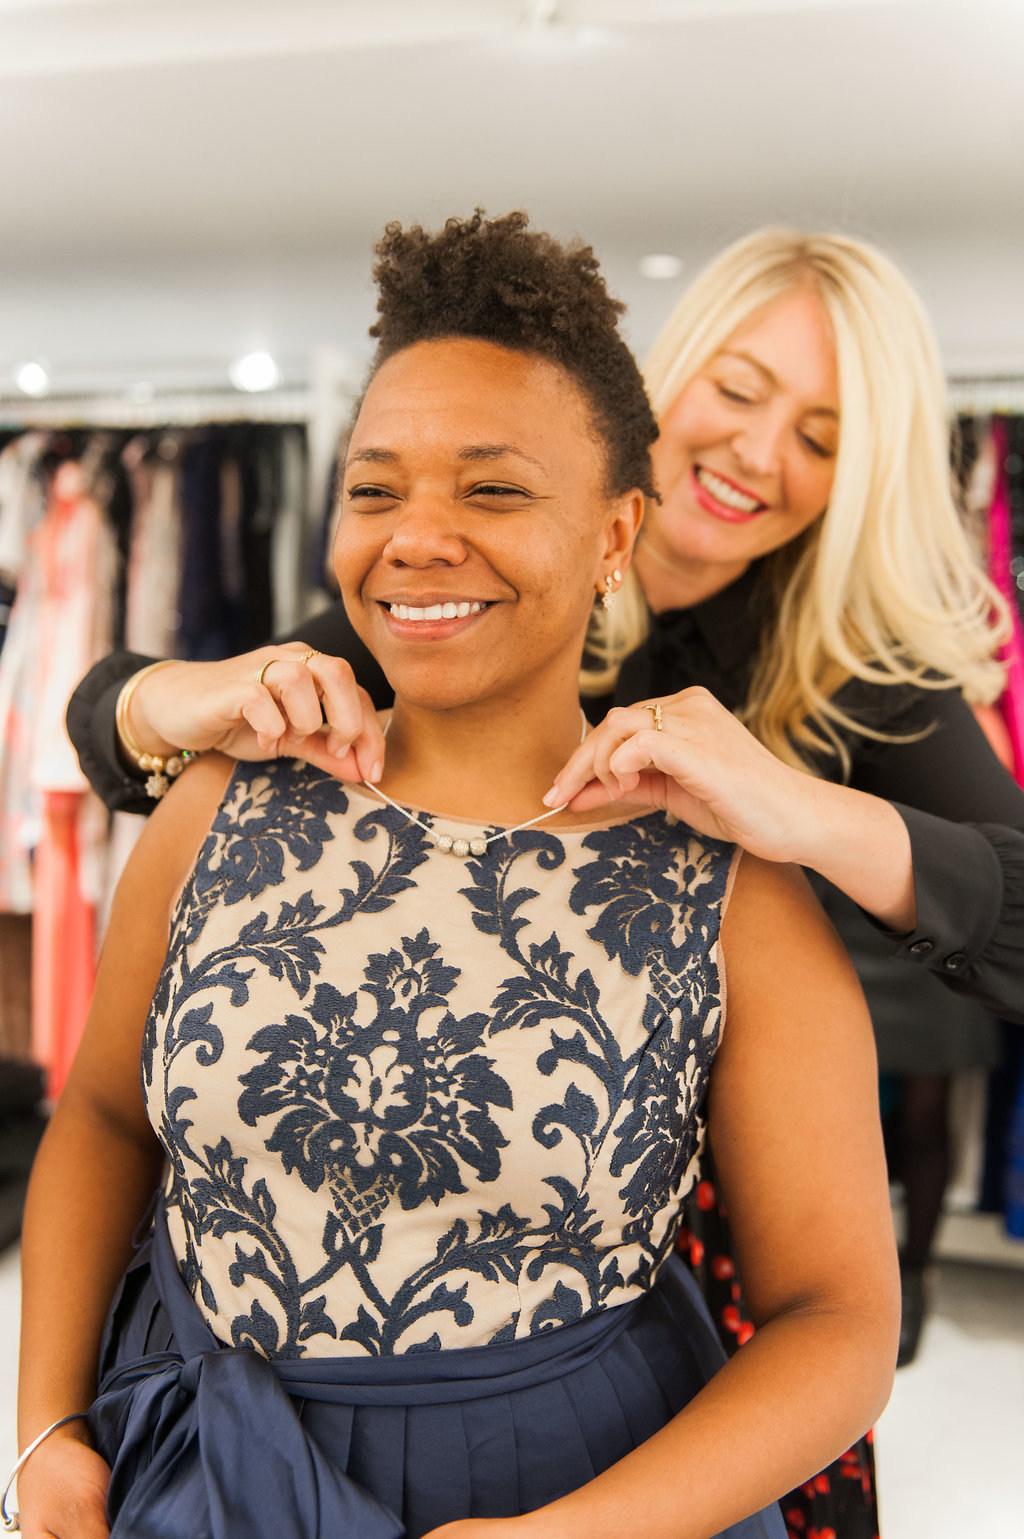 pandora jewelry expands partnership dress for success reg in prnewsfoto pandora jewelry